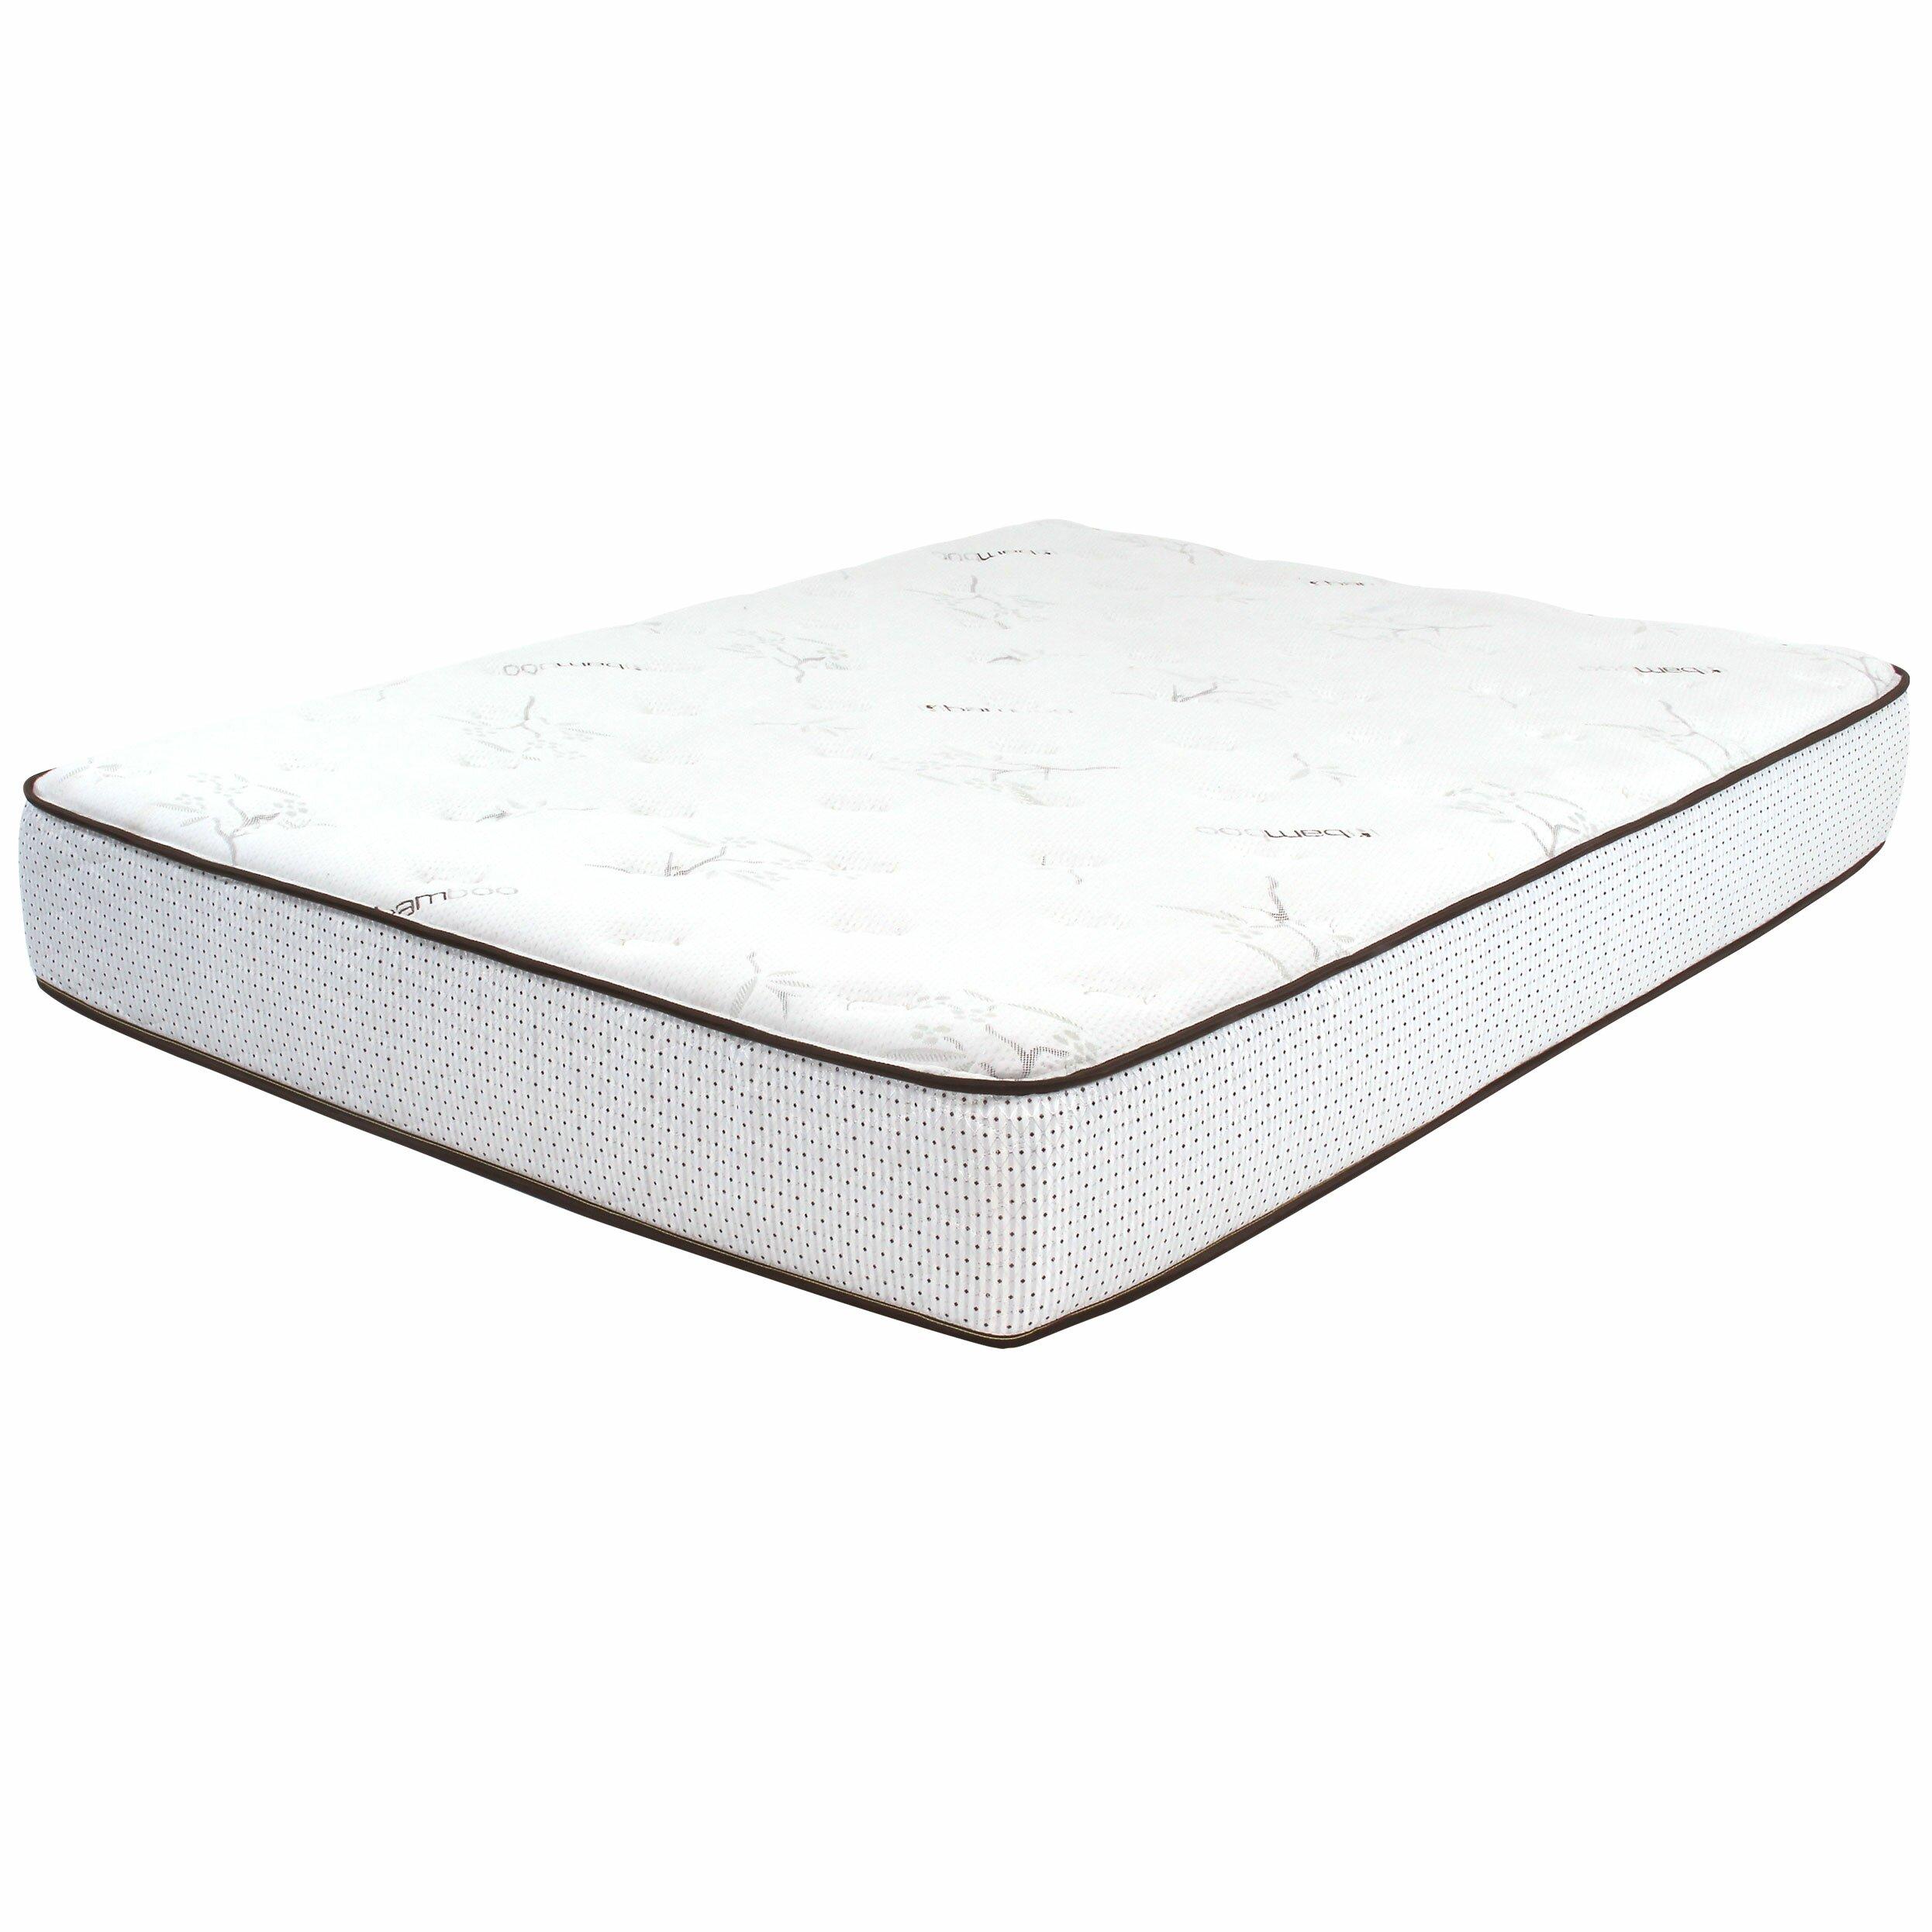 Brooklyn bedding ultimate dreams 10quot latex mattress for Brooklyn latex mattress